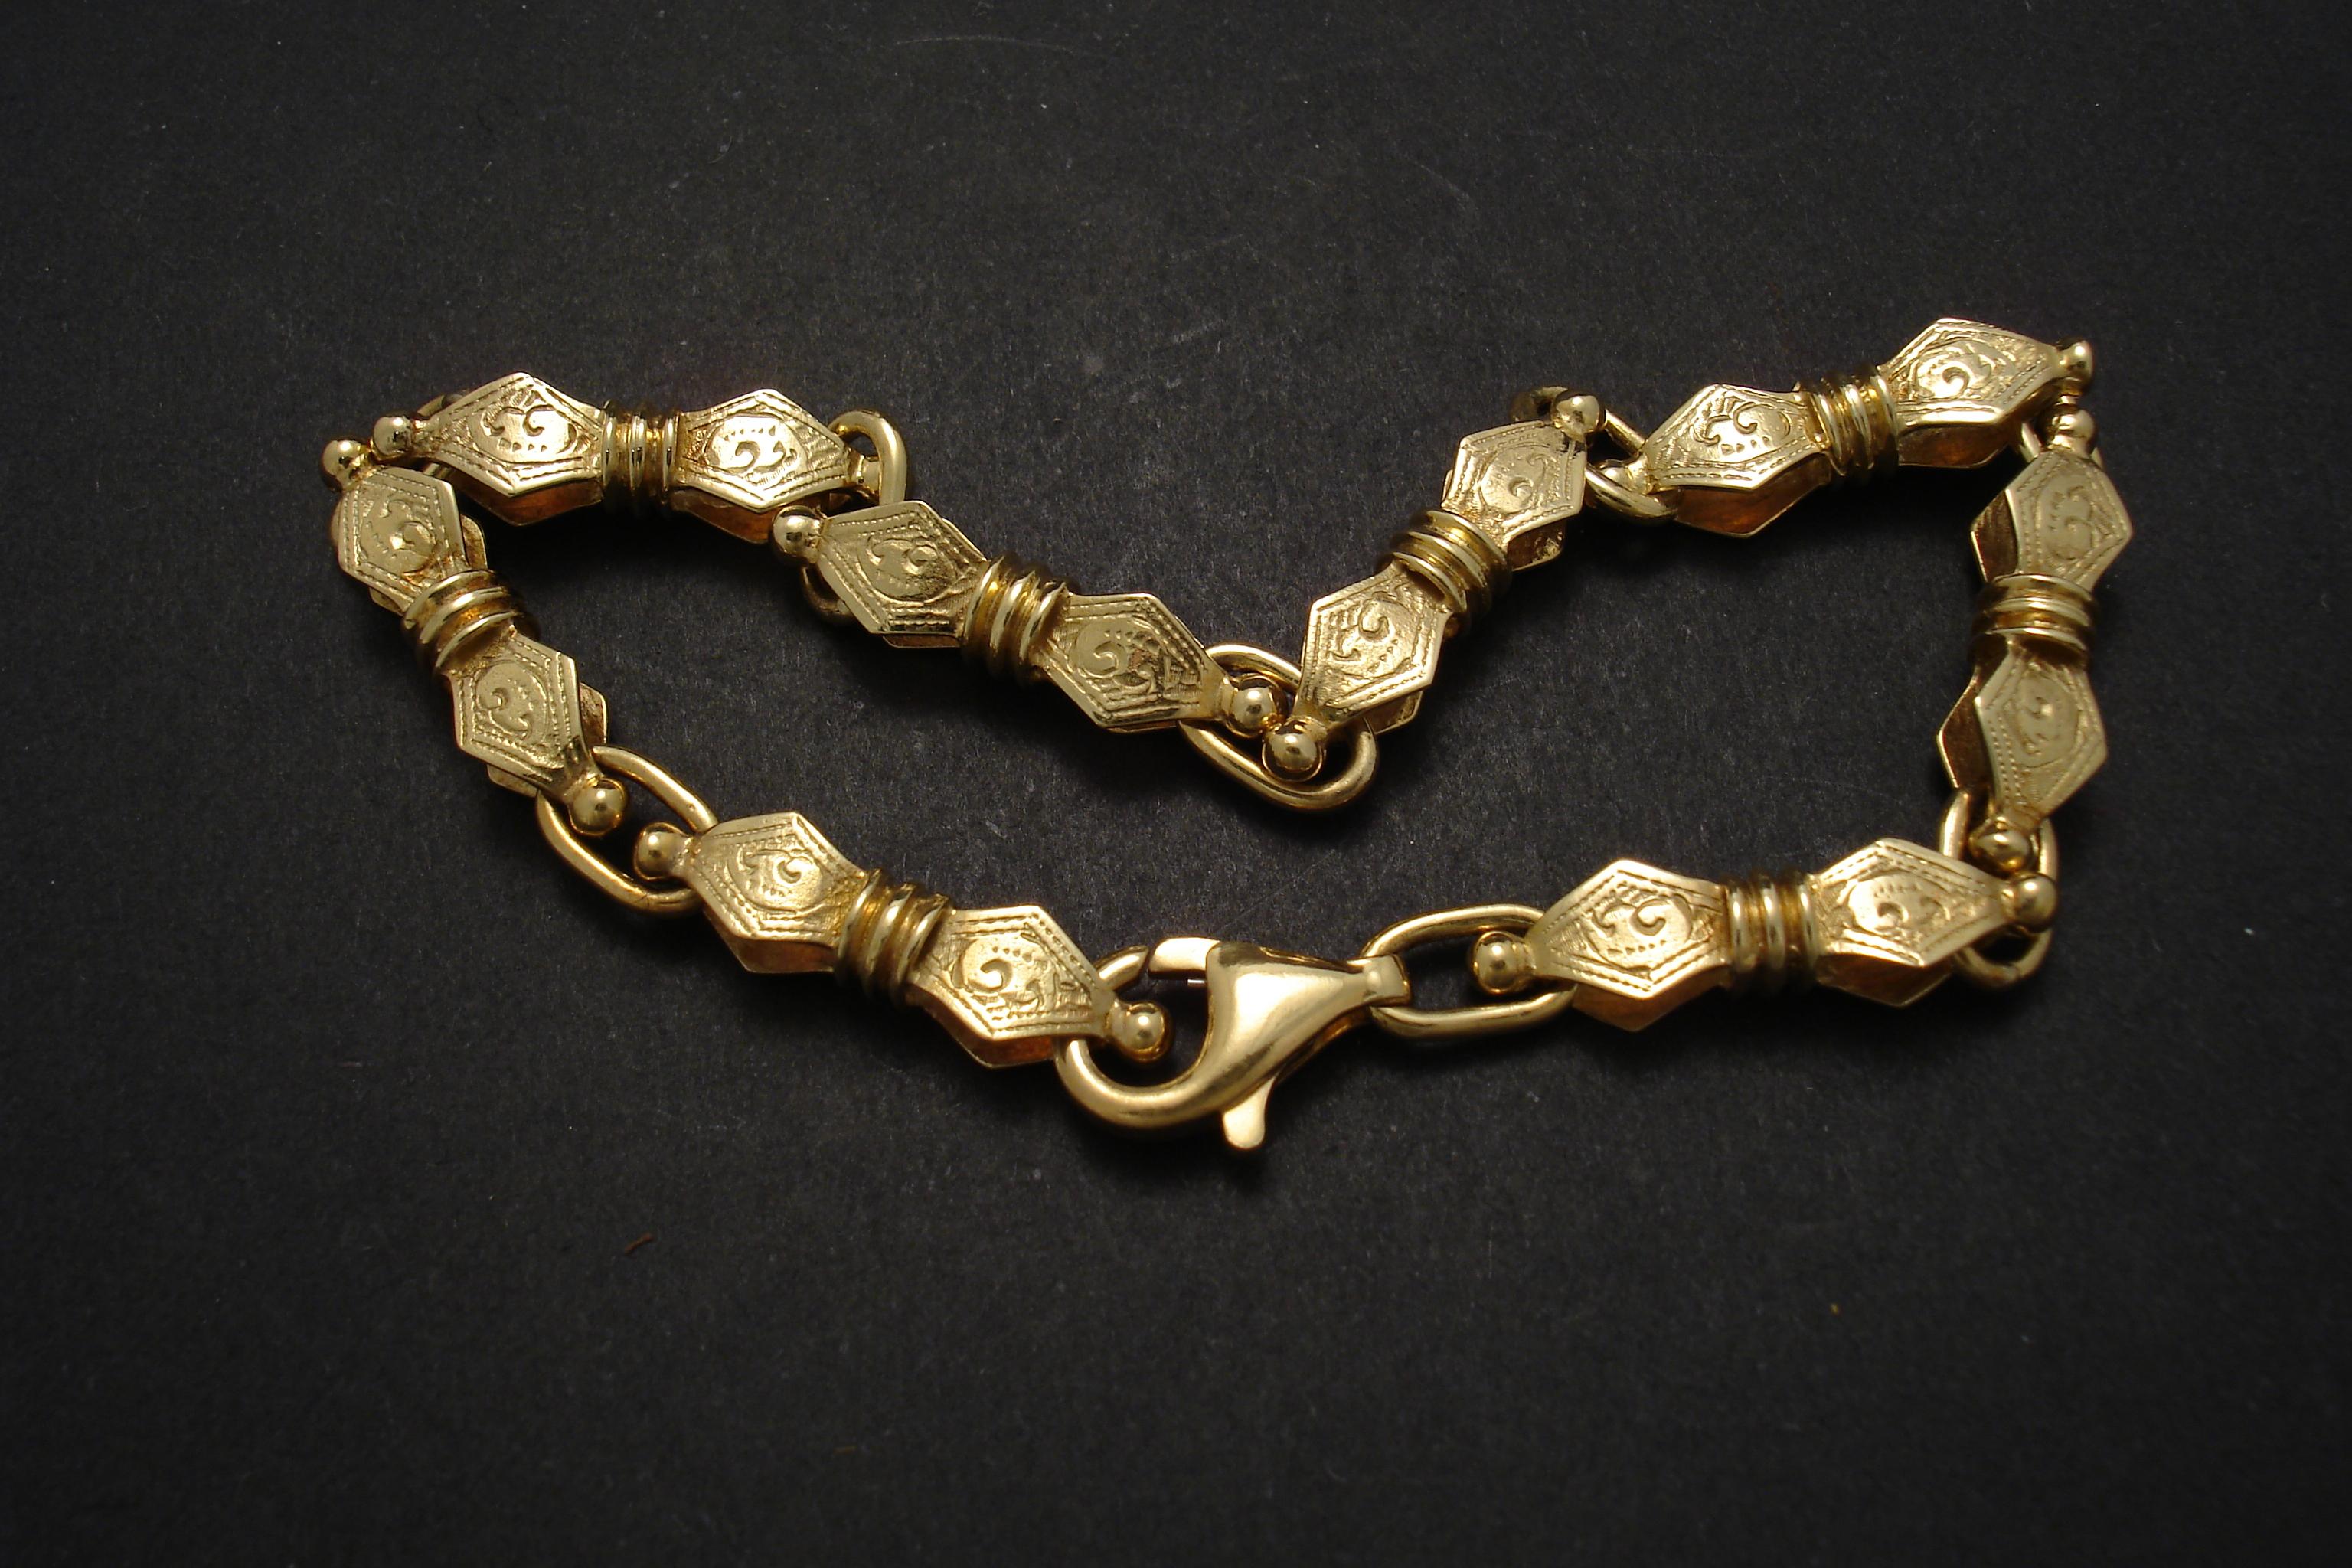 Gold Bracelets - Christopher William Sydney Australia - Antique ...